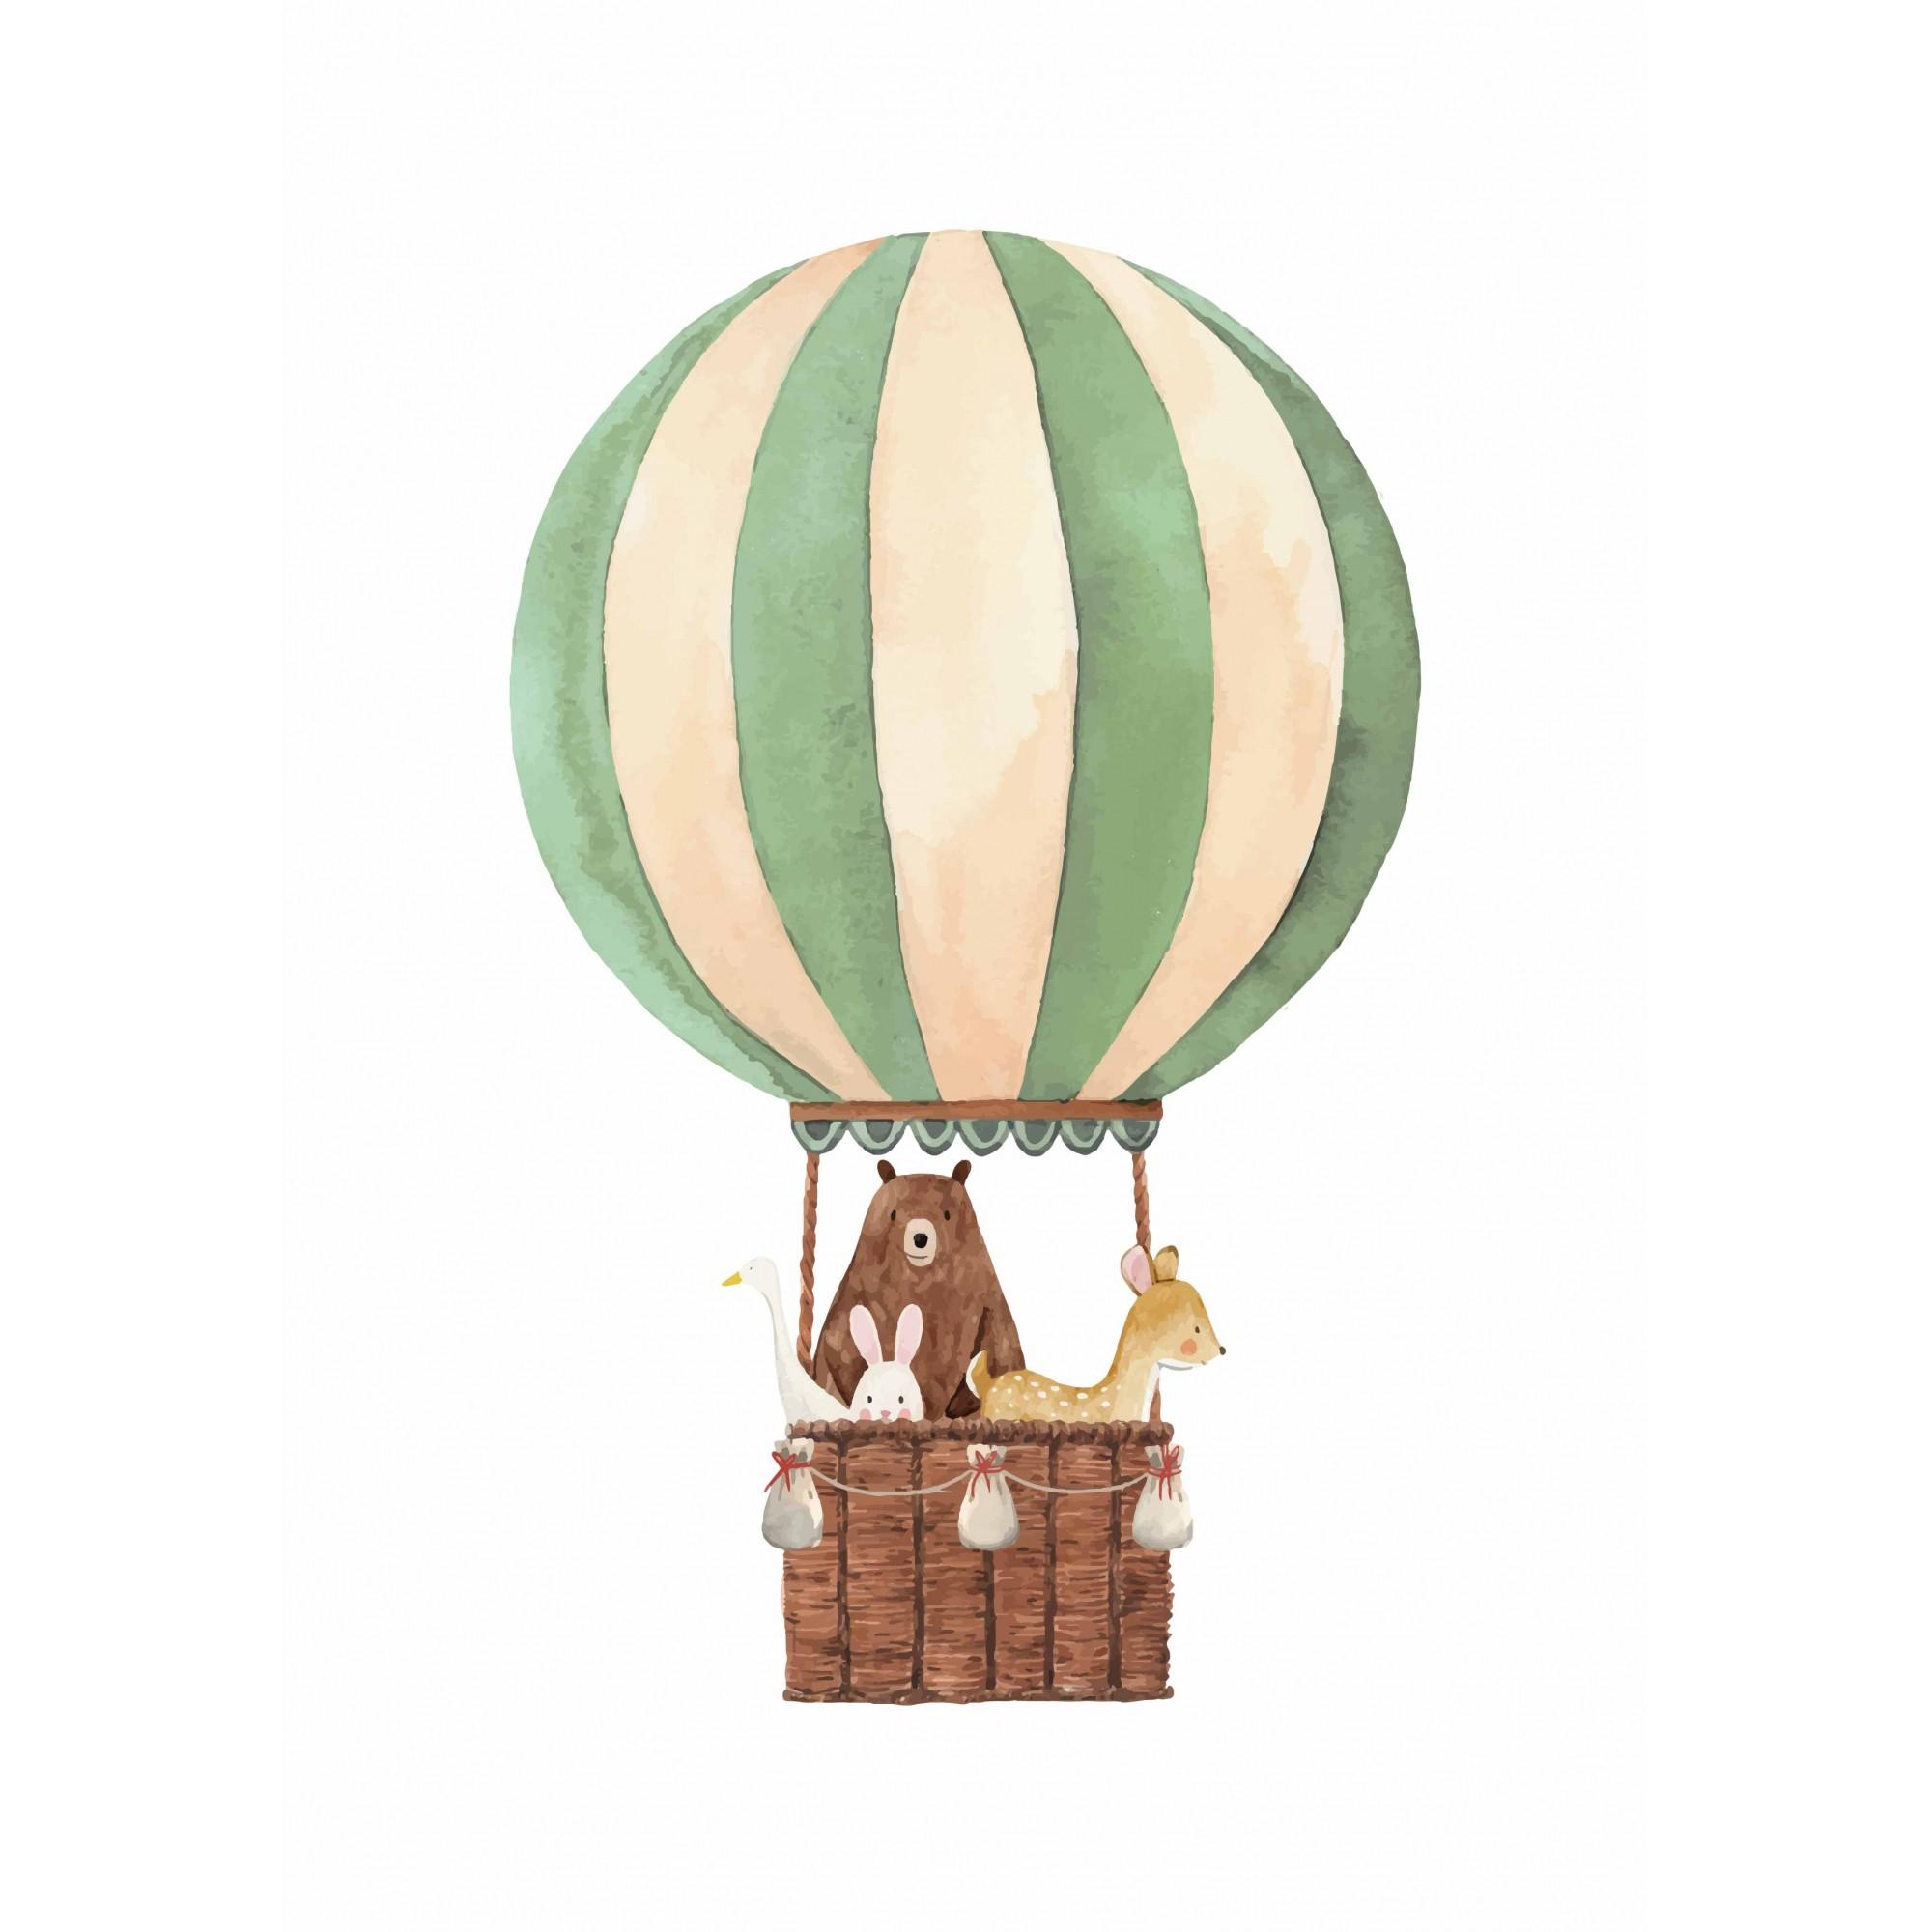 Le Ballon III